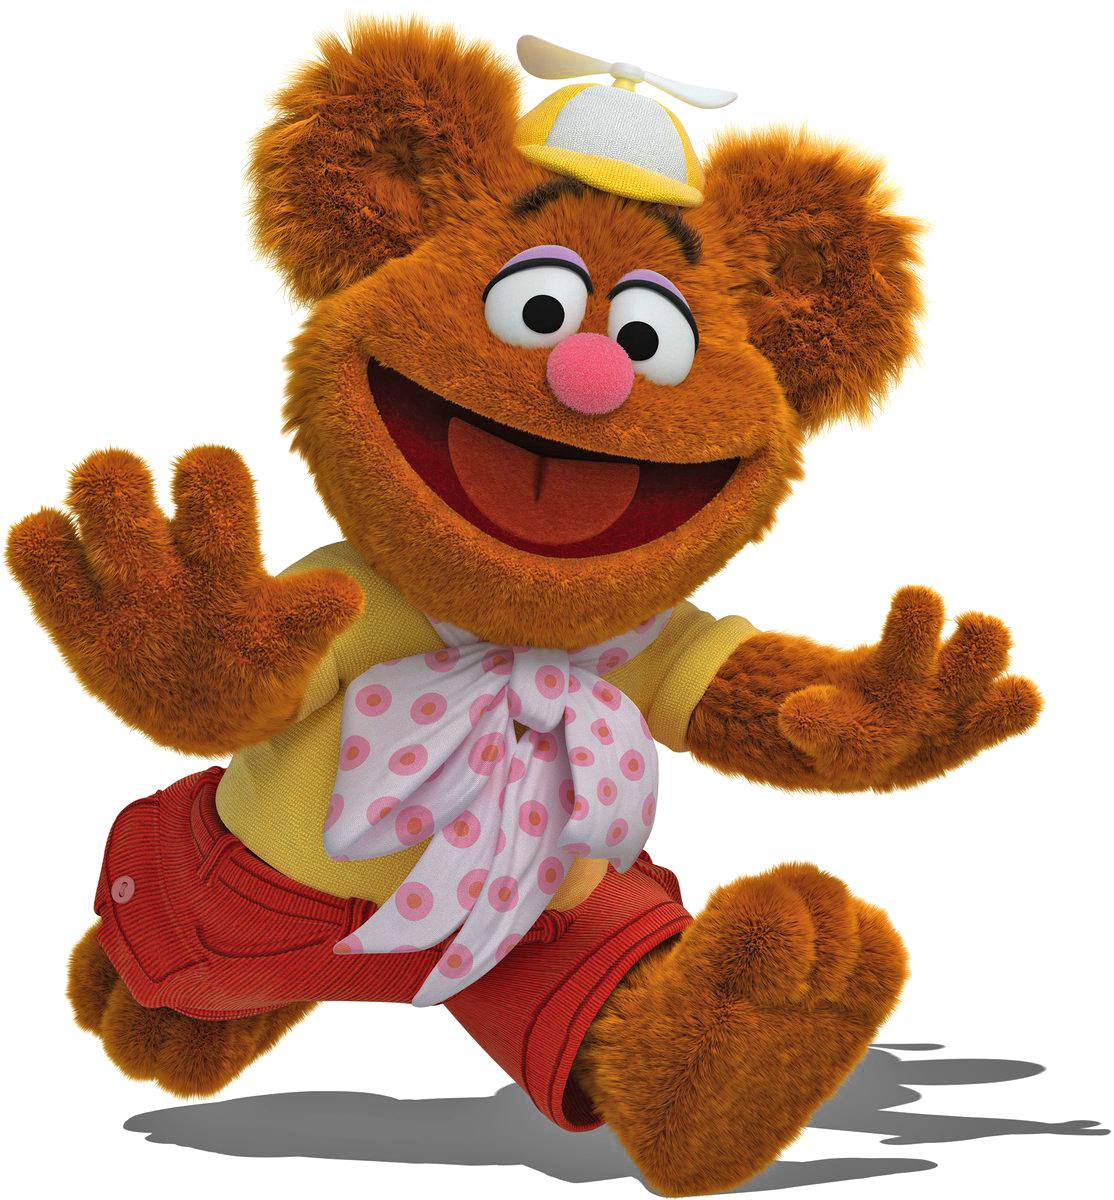 Muppet Babies - Fozzie (Puzzle) - YouTube  Muppet Babies Fozzie